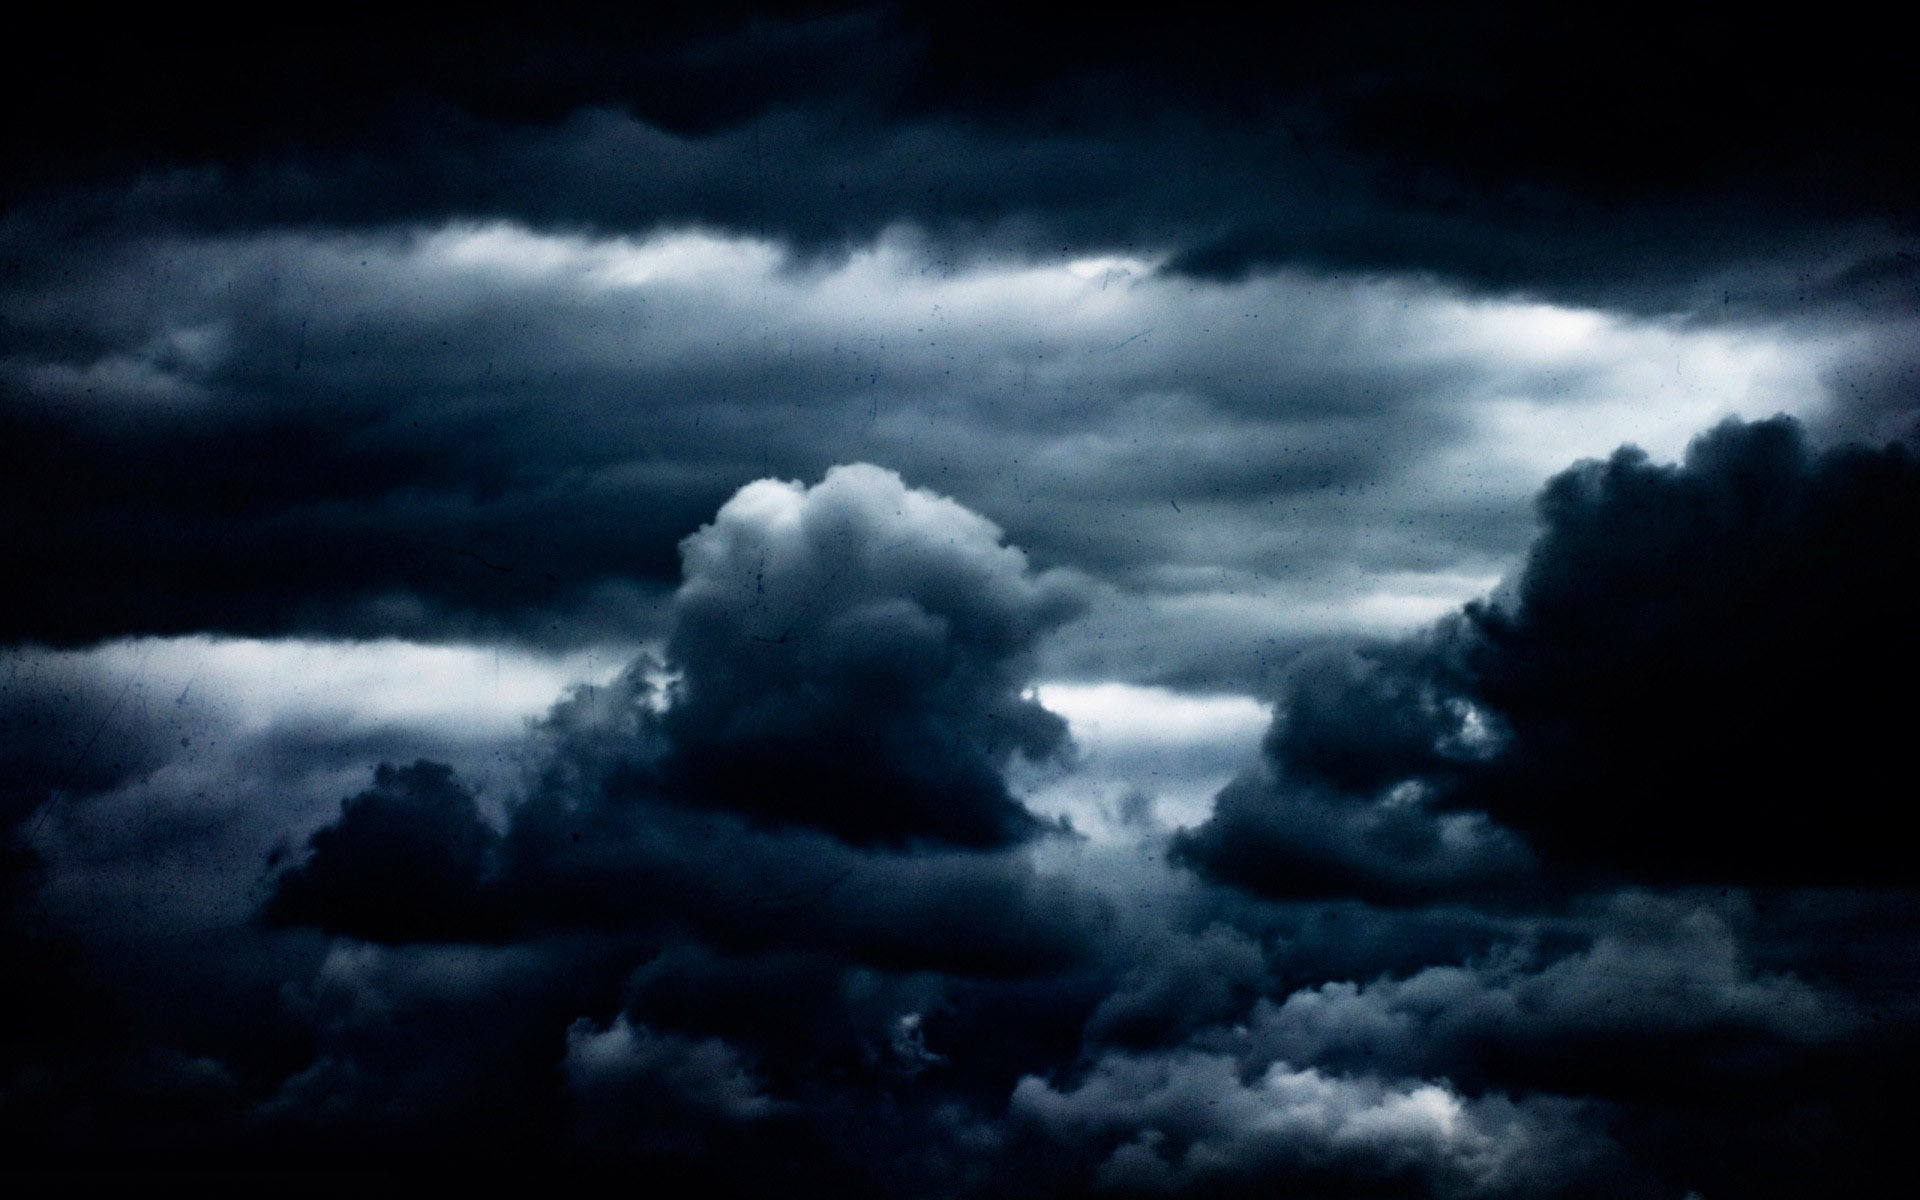 Dark clouds wallpaper 11508 1920x1200